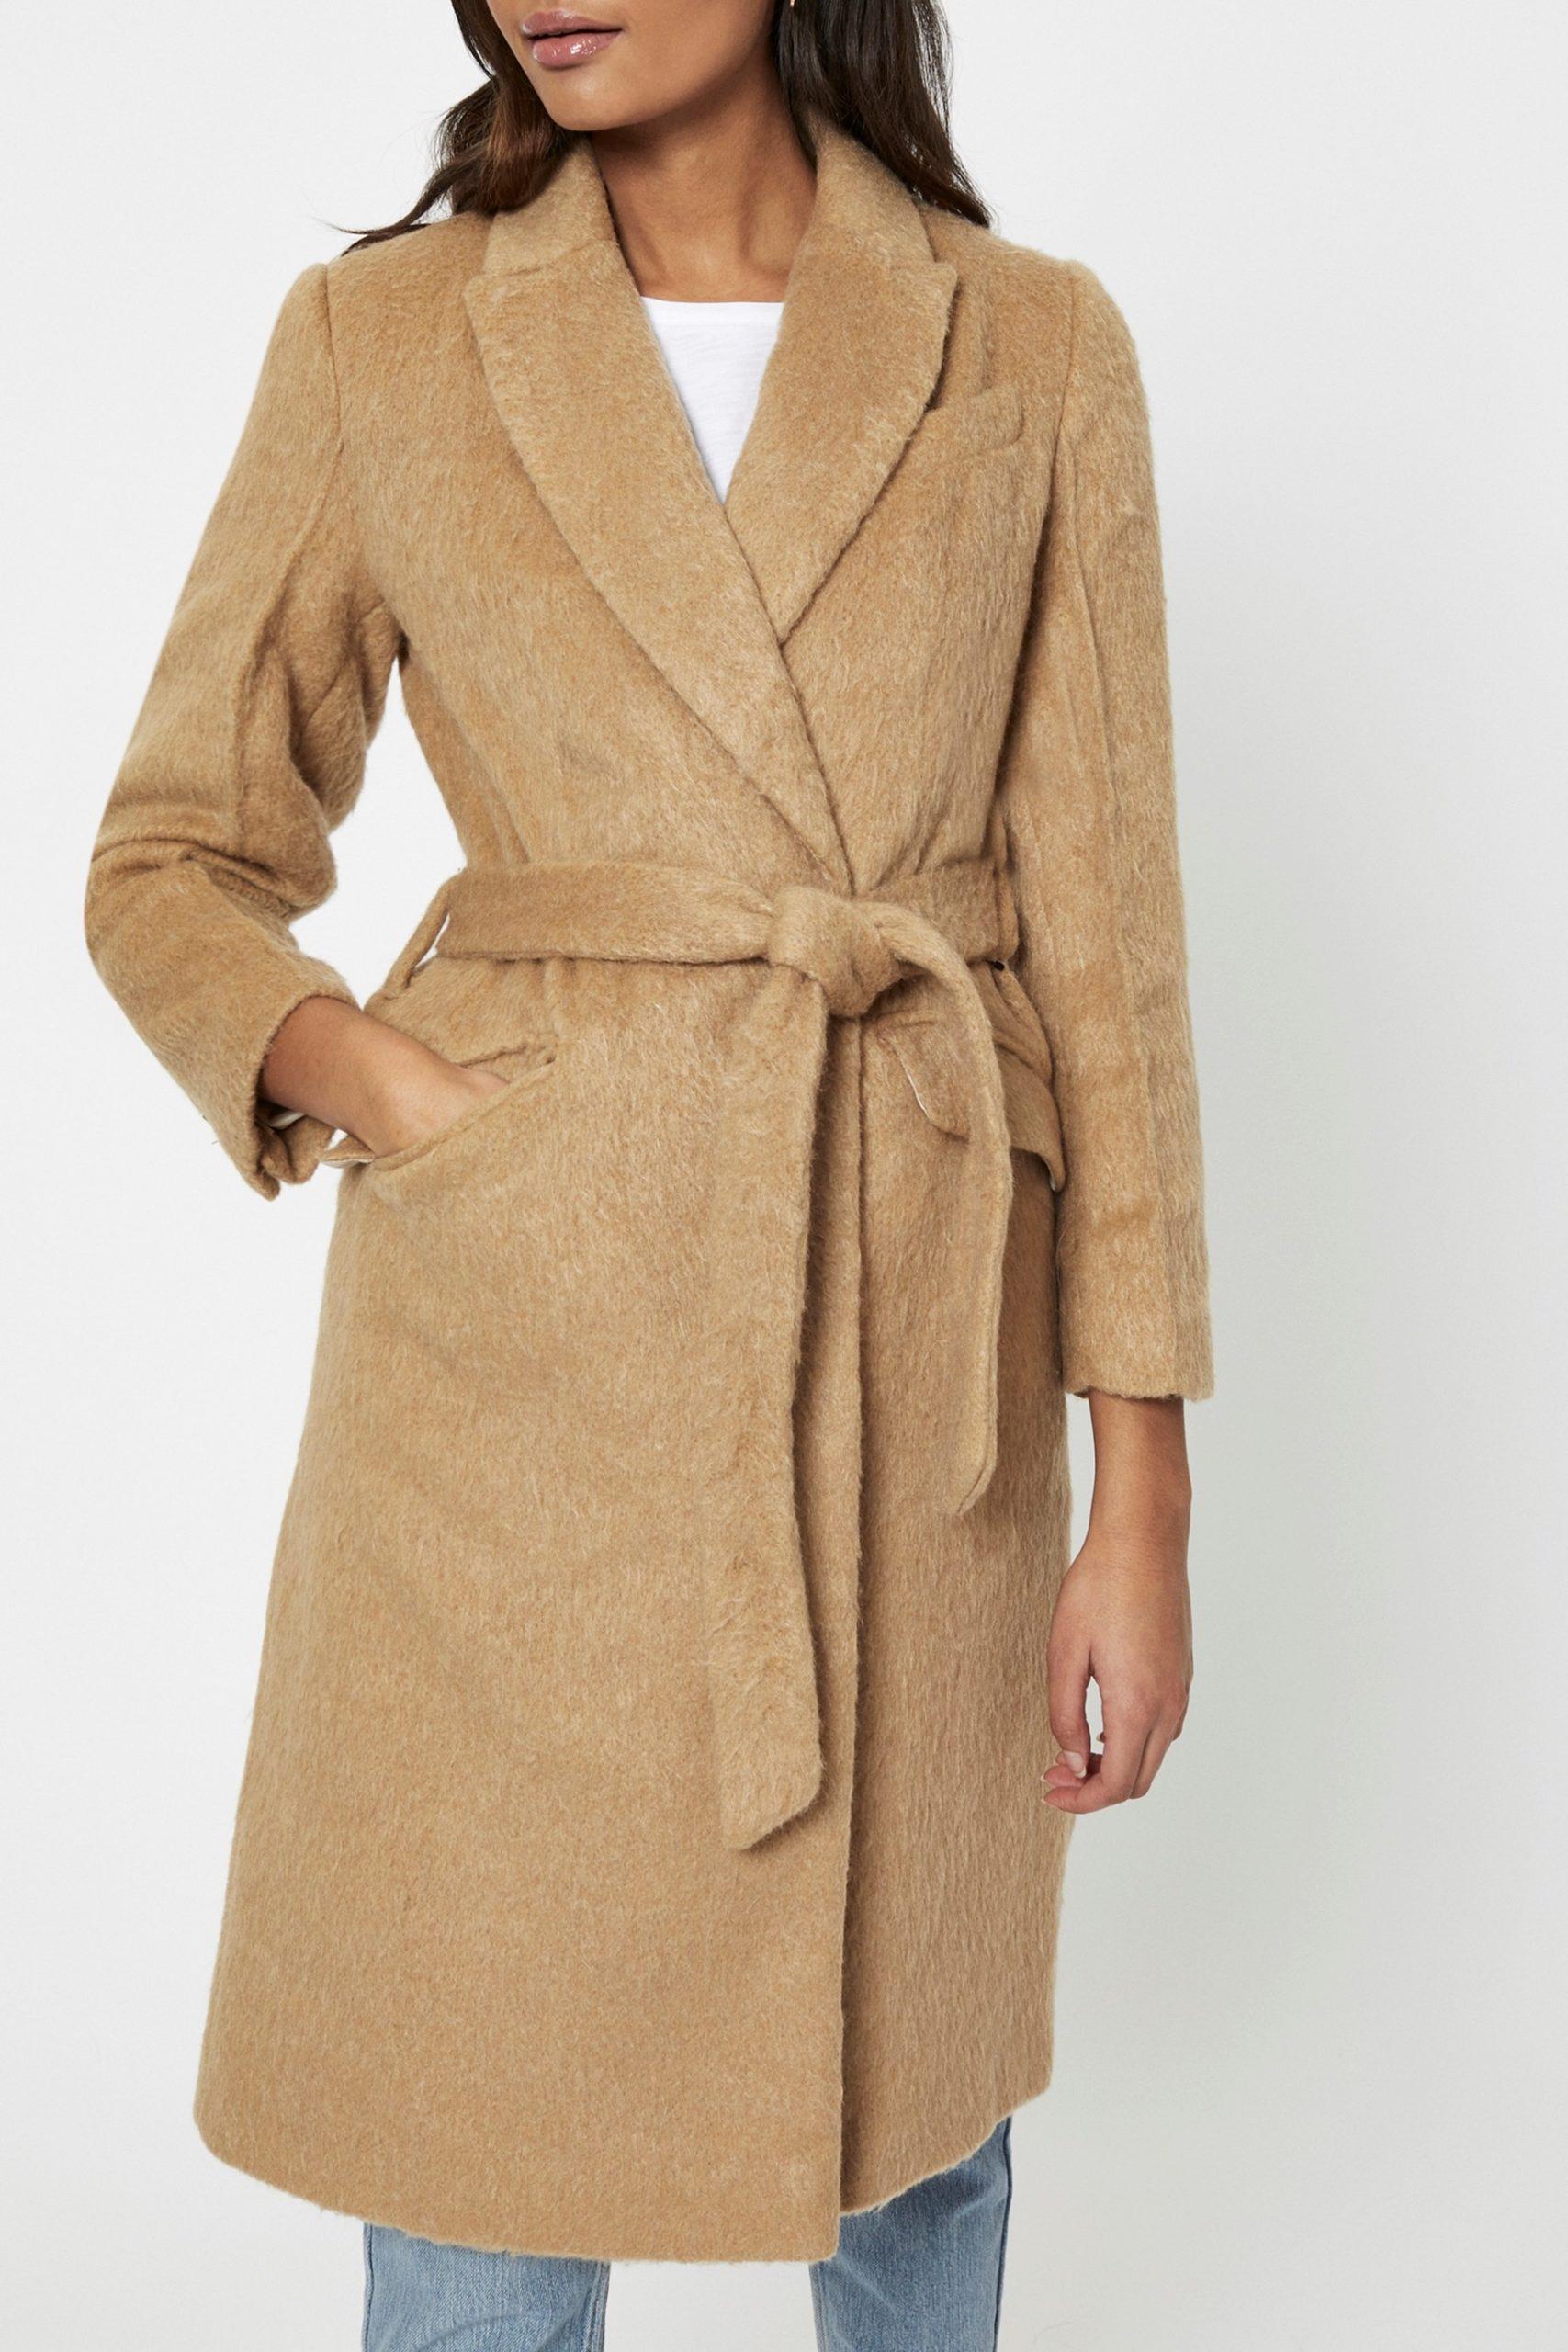 Topshop Petite Manhattan Belted Coat